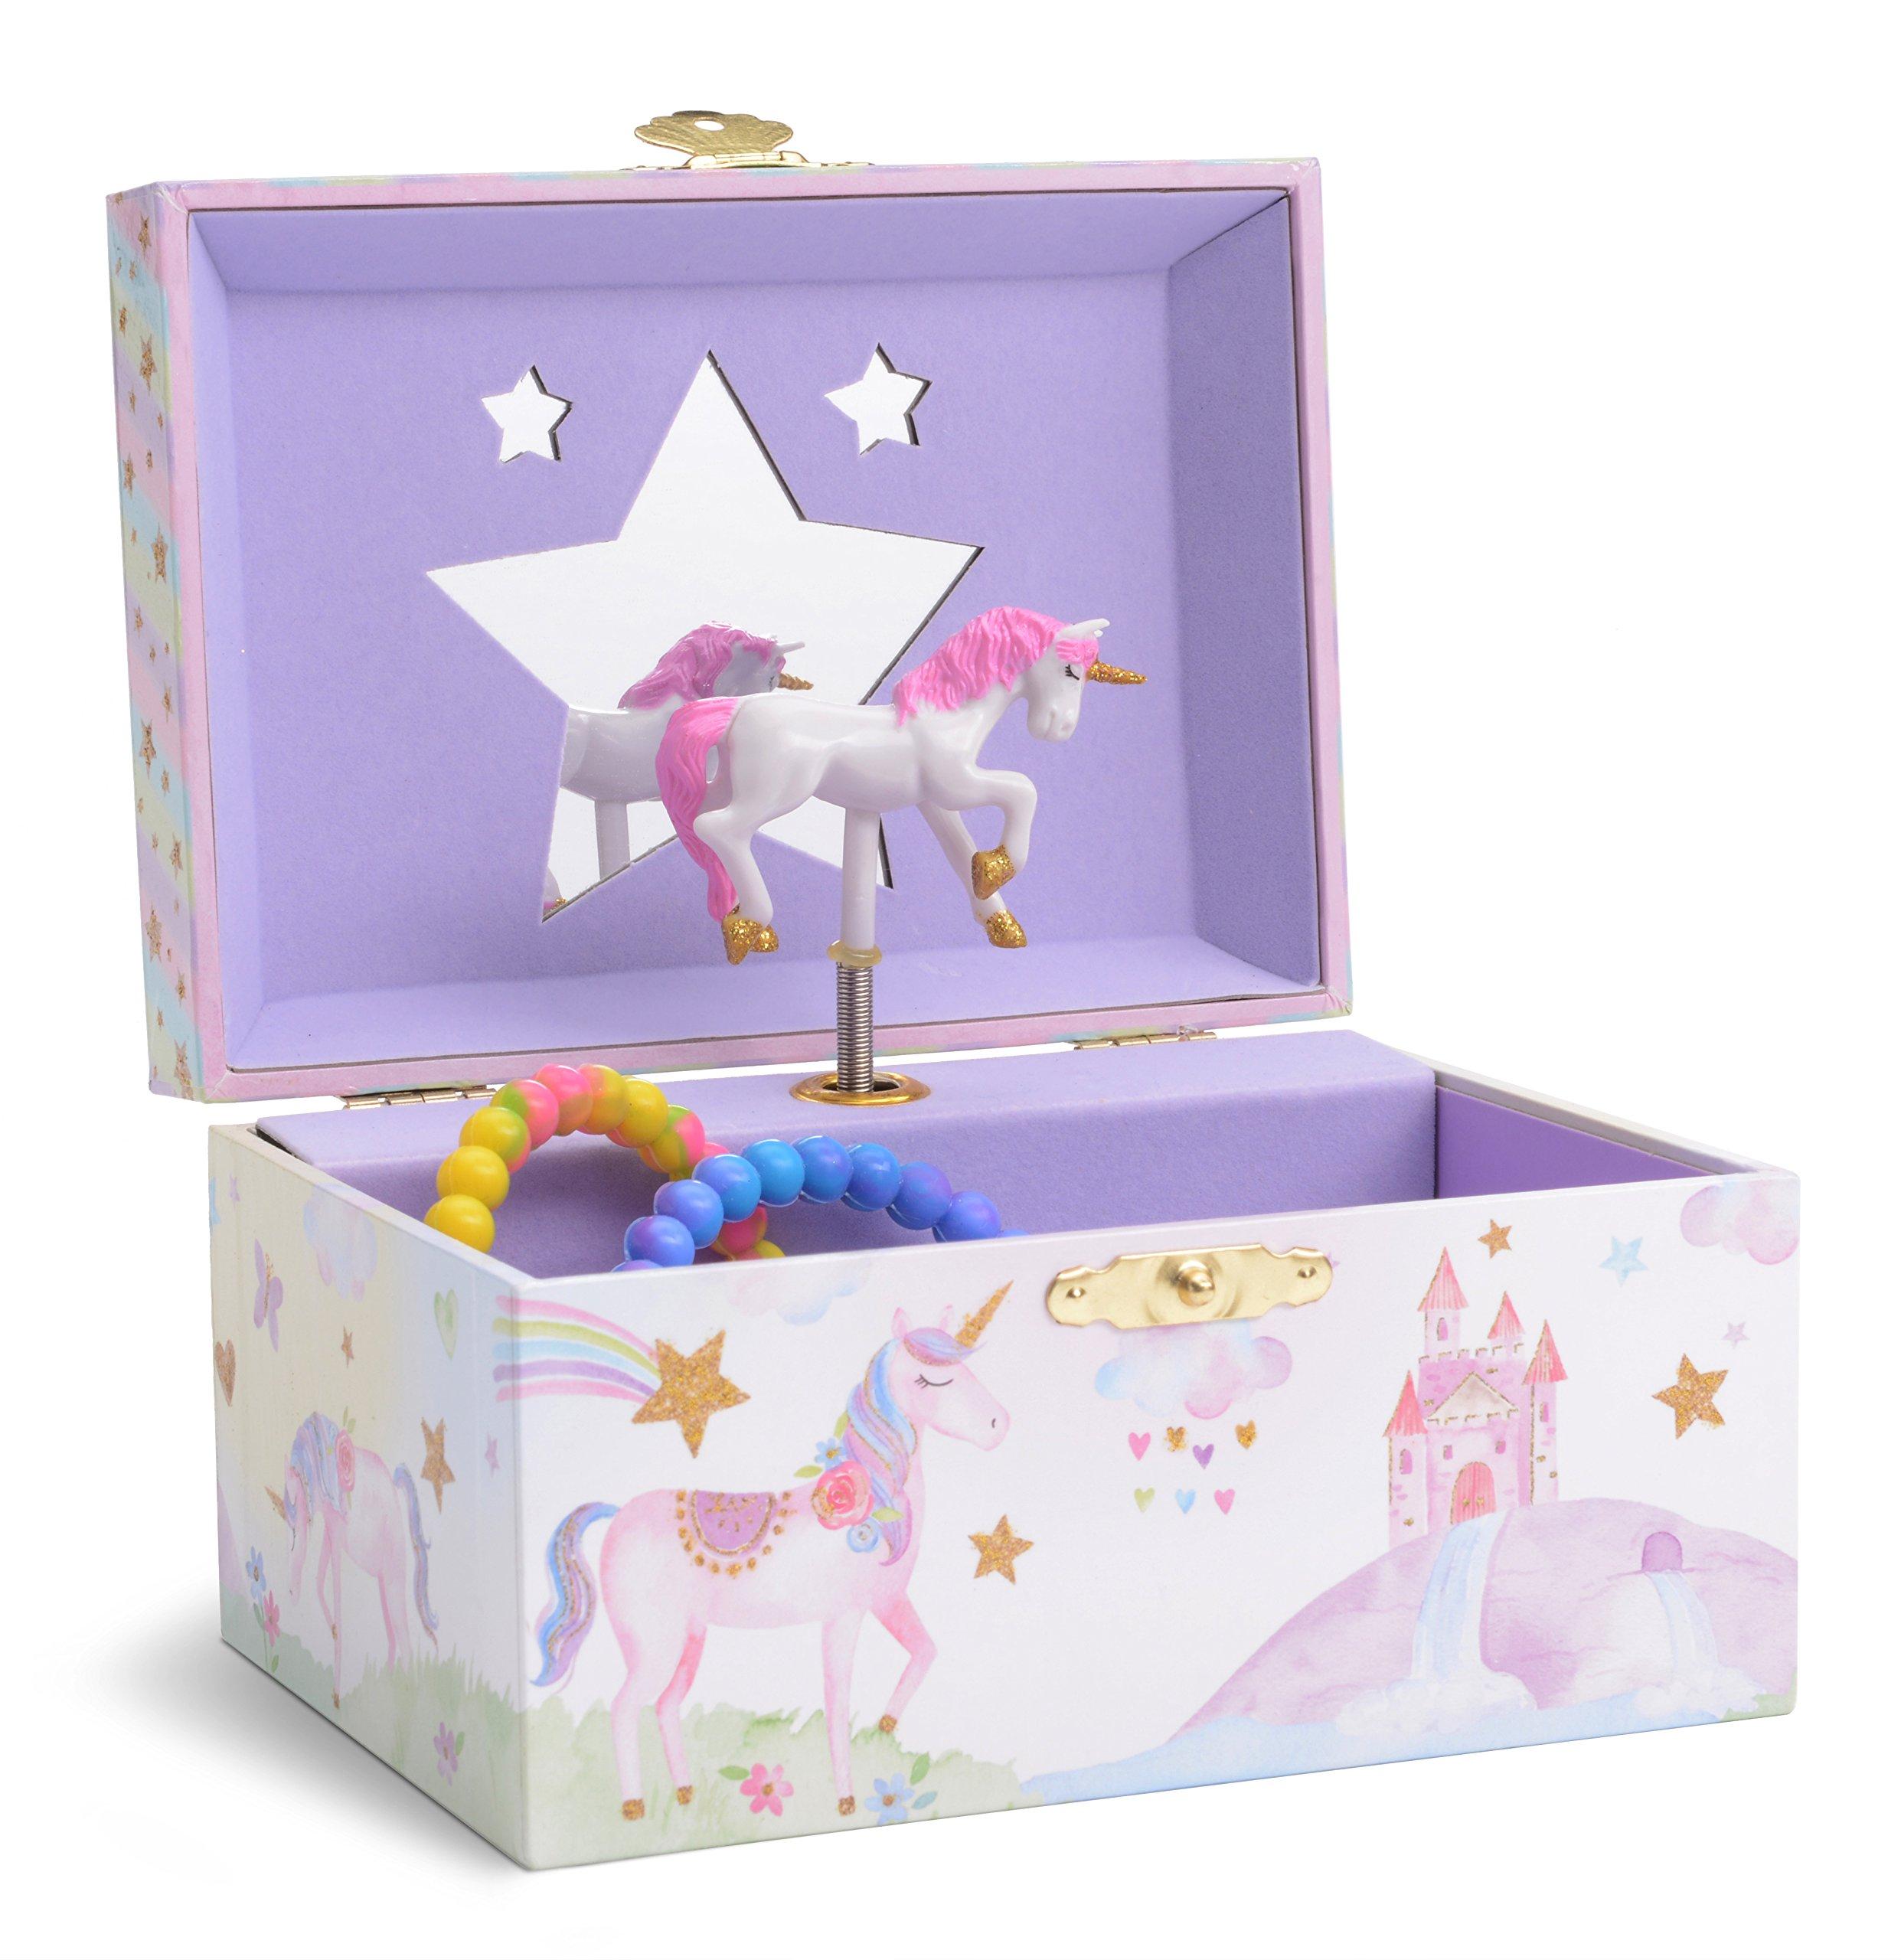 JewelKeeper Girl's Musical Jewelry Storage Box with Spinning Unicorn, Glitter Rainbow and Stars Design, The Unicorn Tune by Jewelkeeper